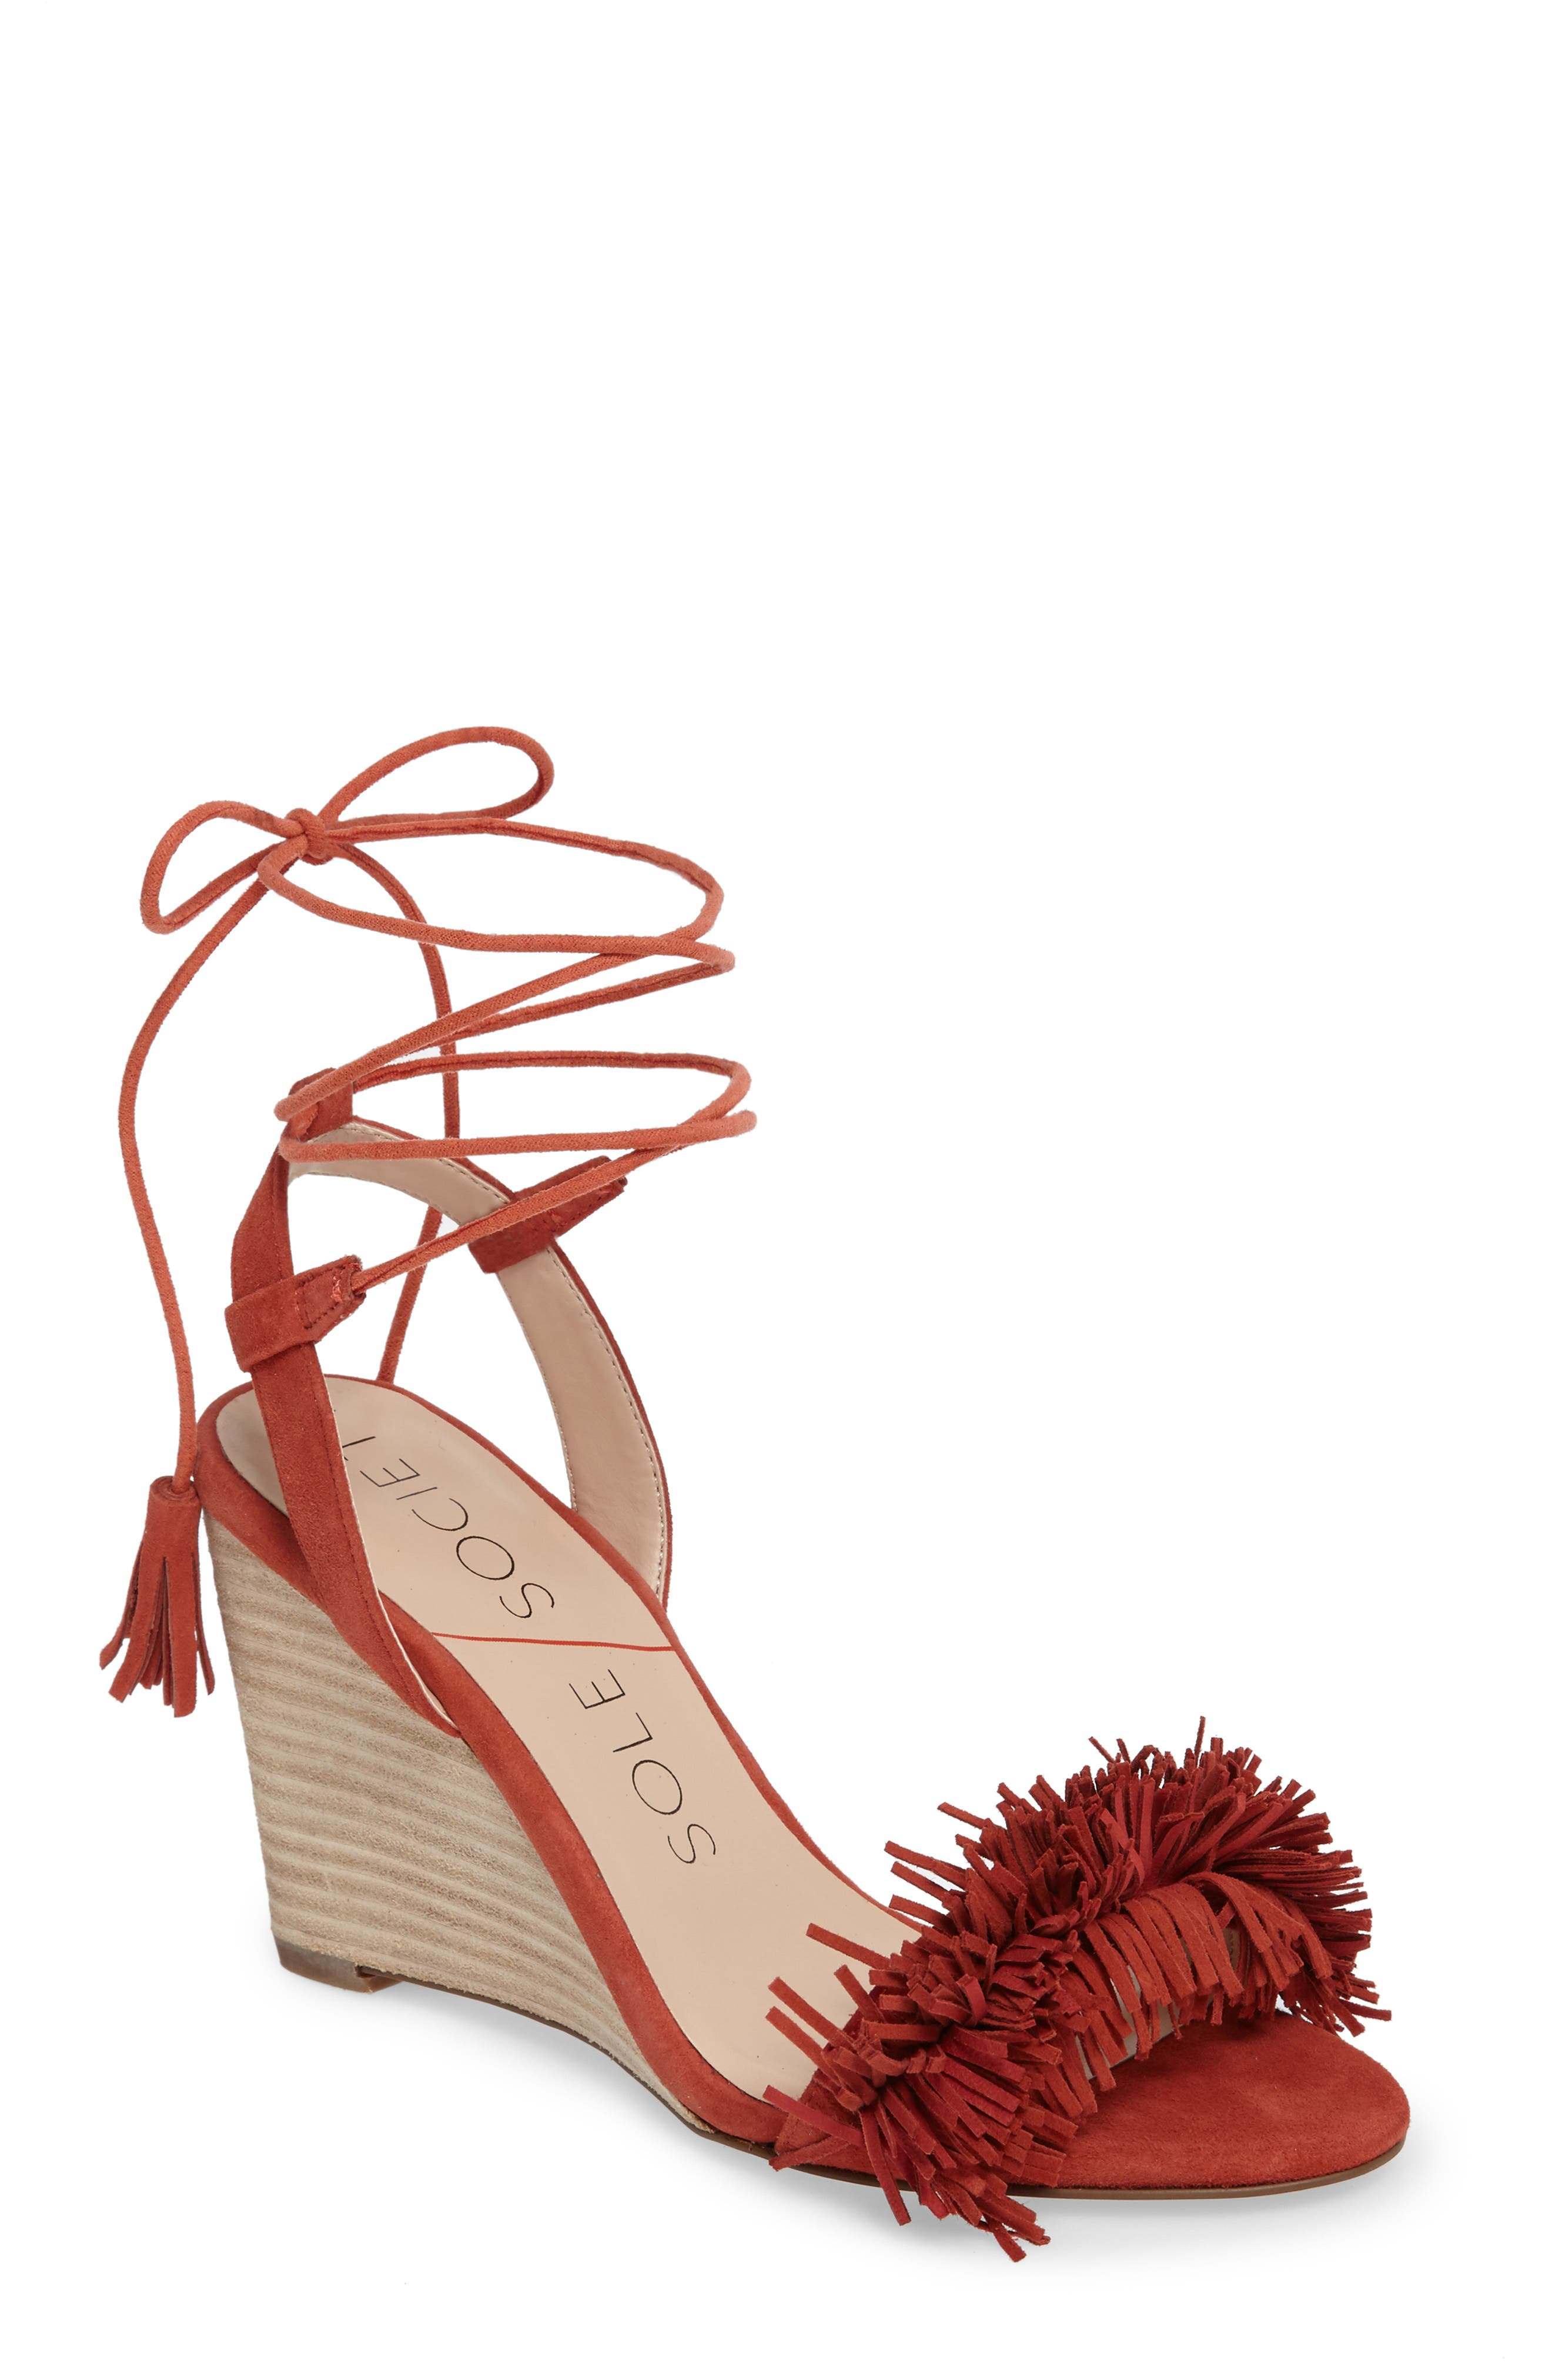 Main Image - Sole Society Rosea Ankle Wrap Sandal (Women)